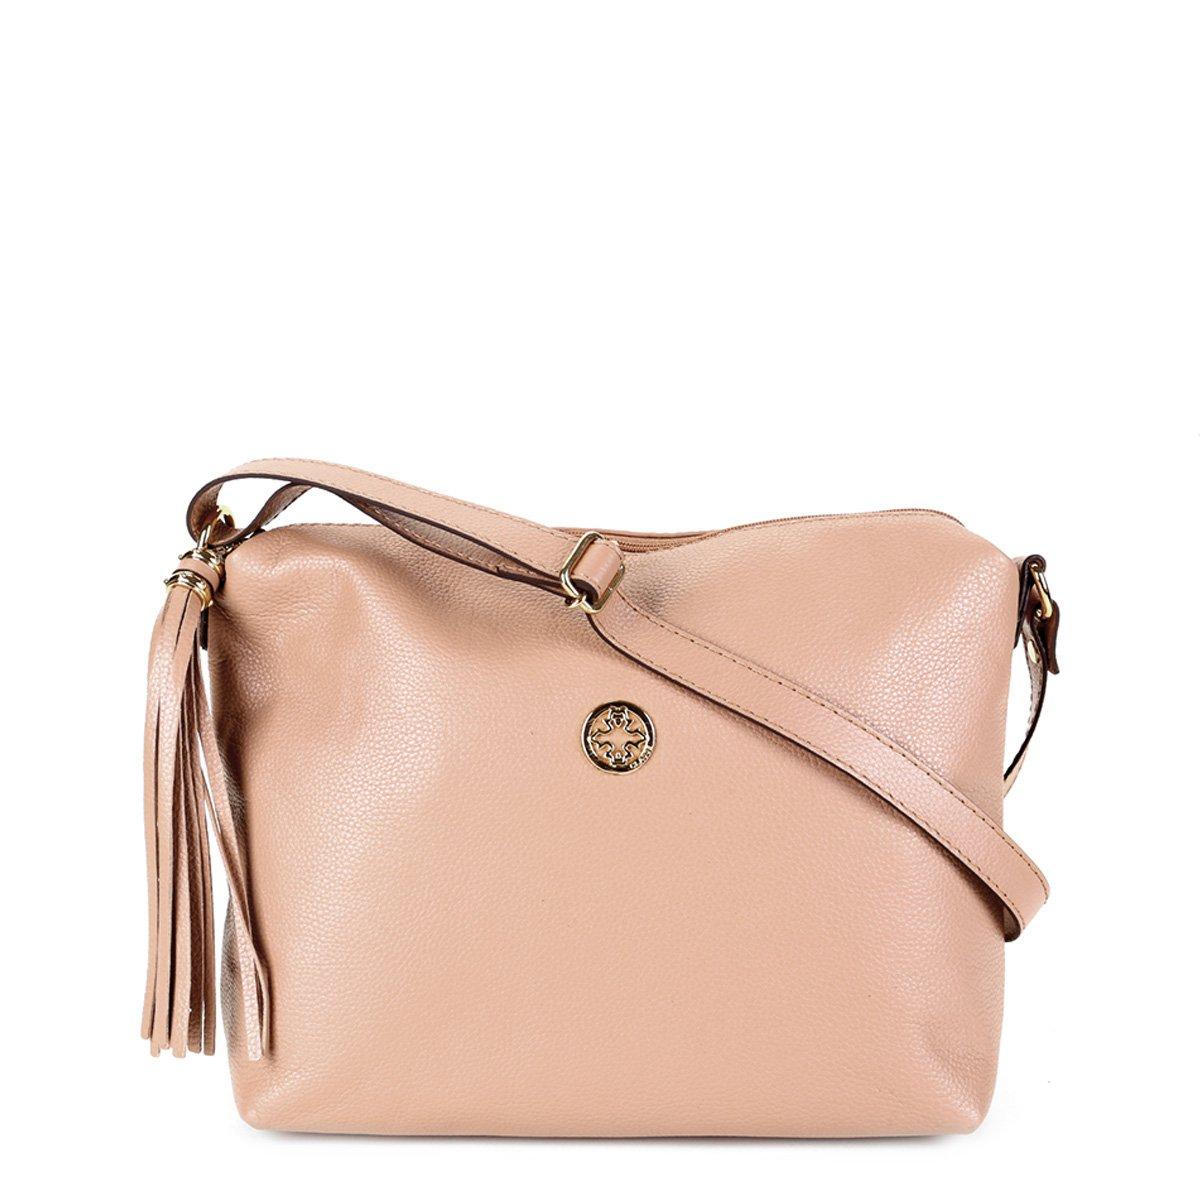 Bolsa Couro Classe Couro Handbag Tiracolo Média Feminina